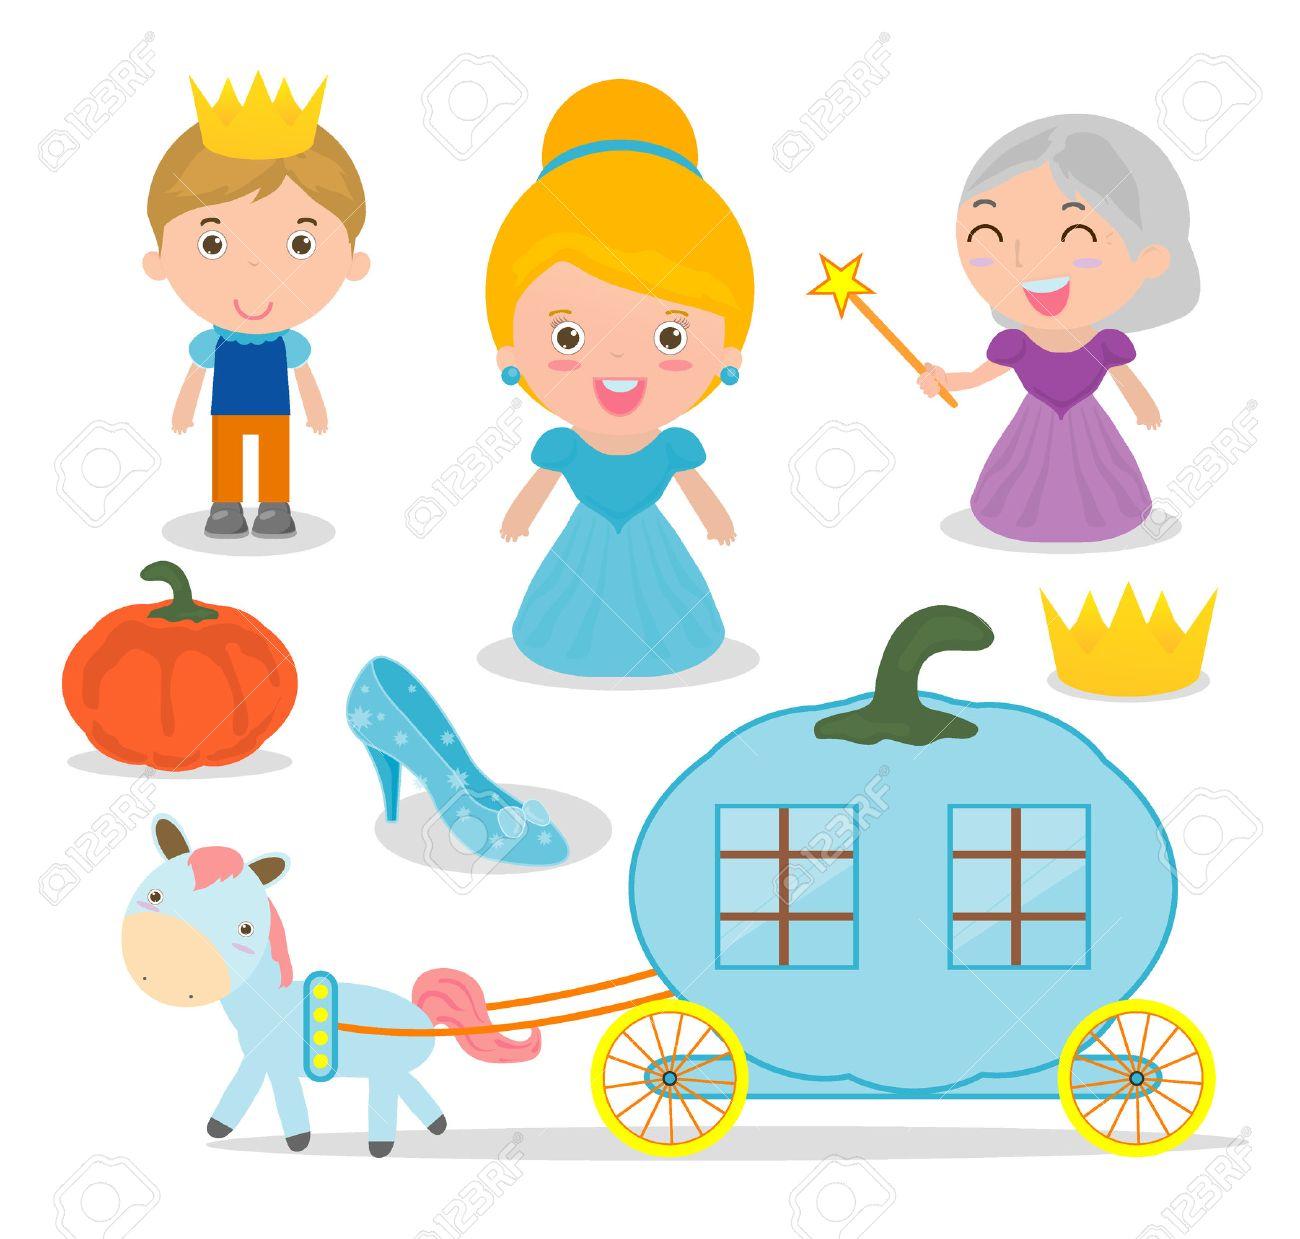 Cinderella vector illustration set on white background - 67894141